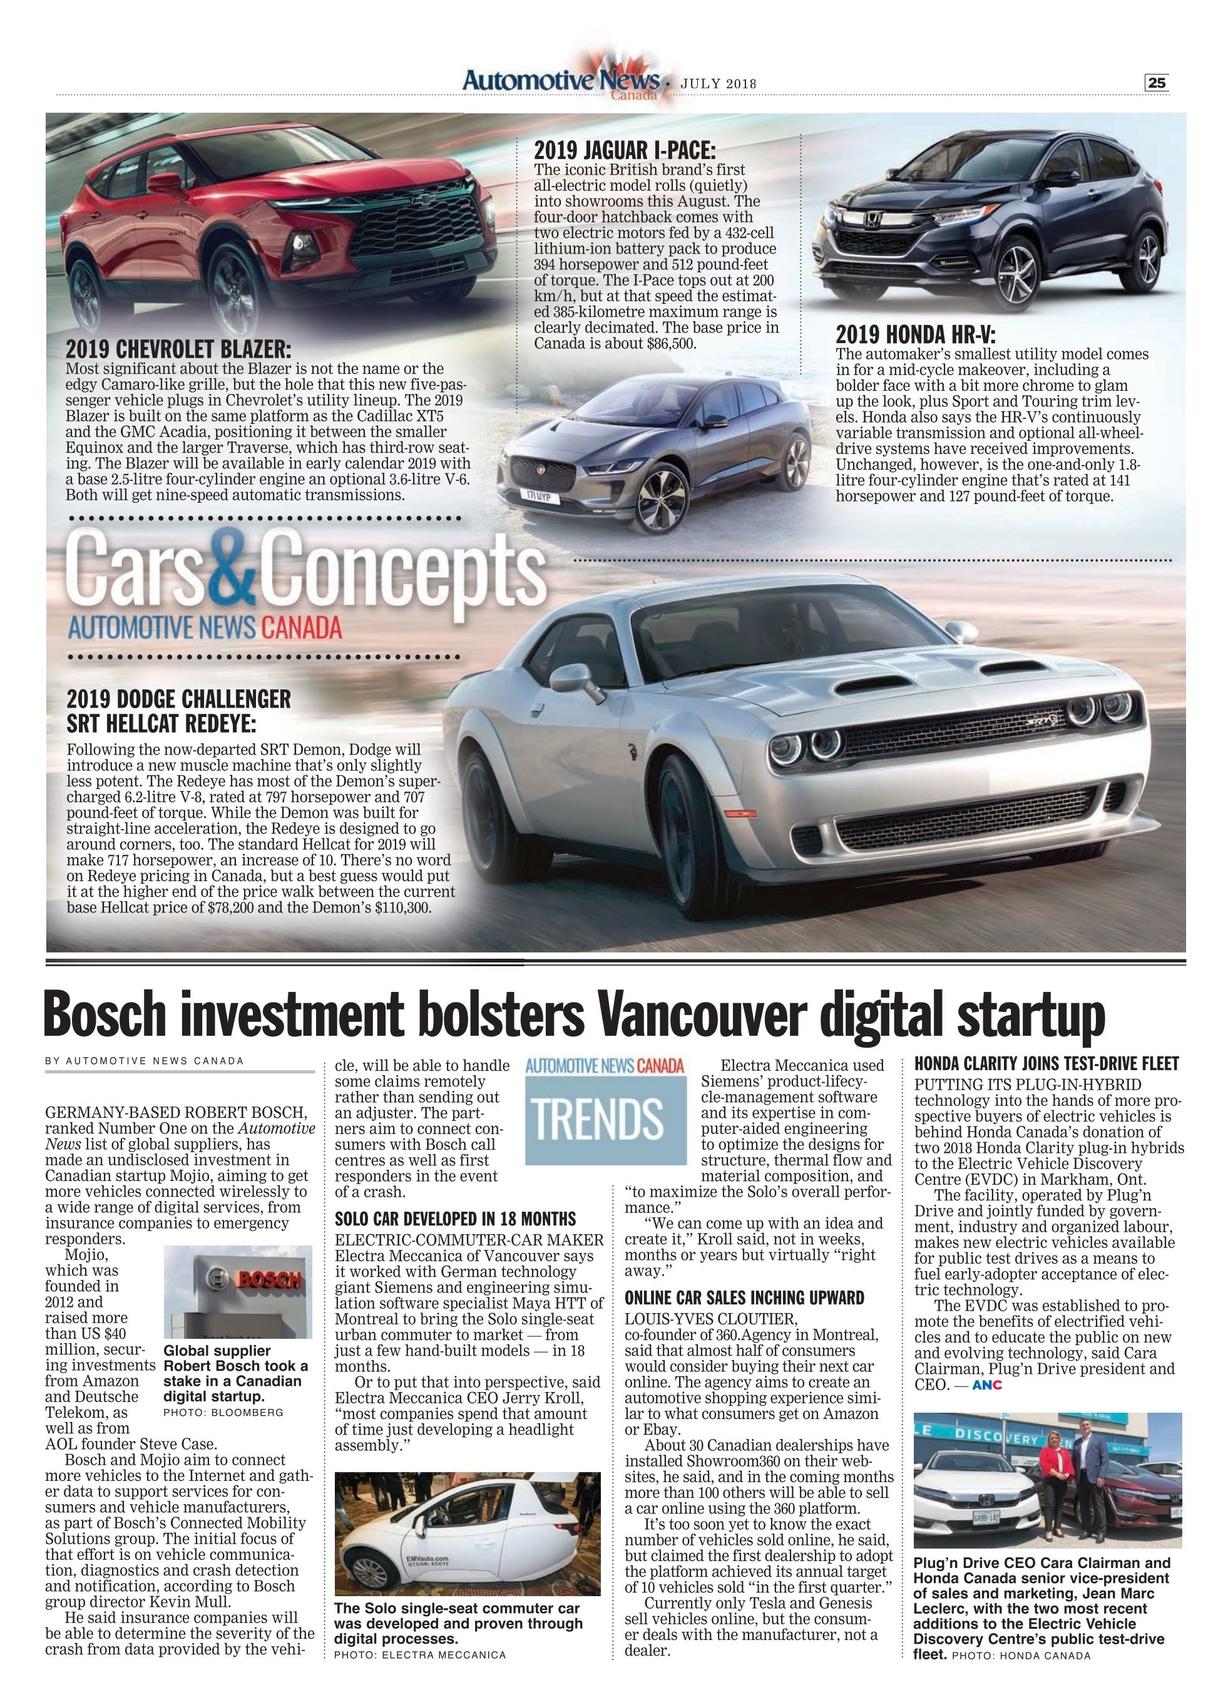 Car News Canada